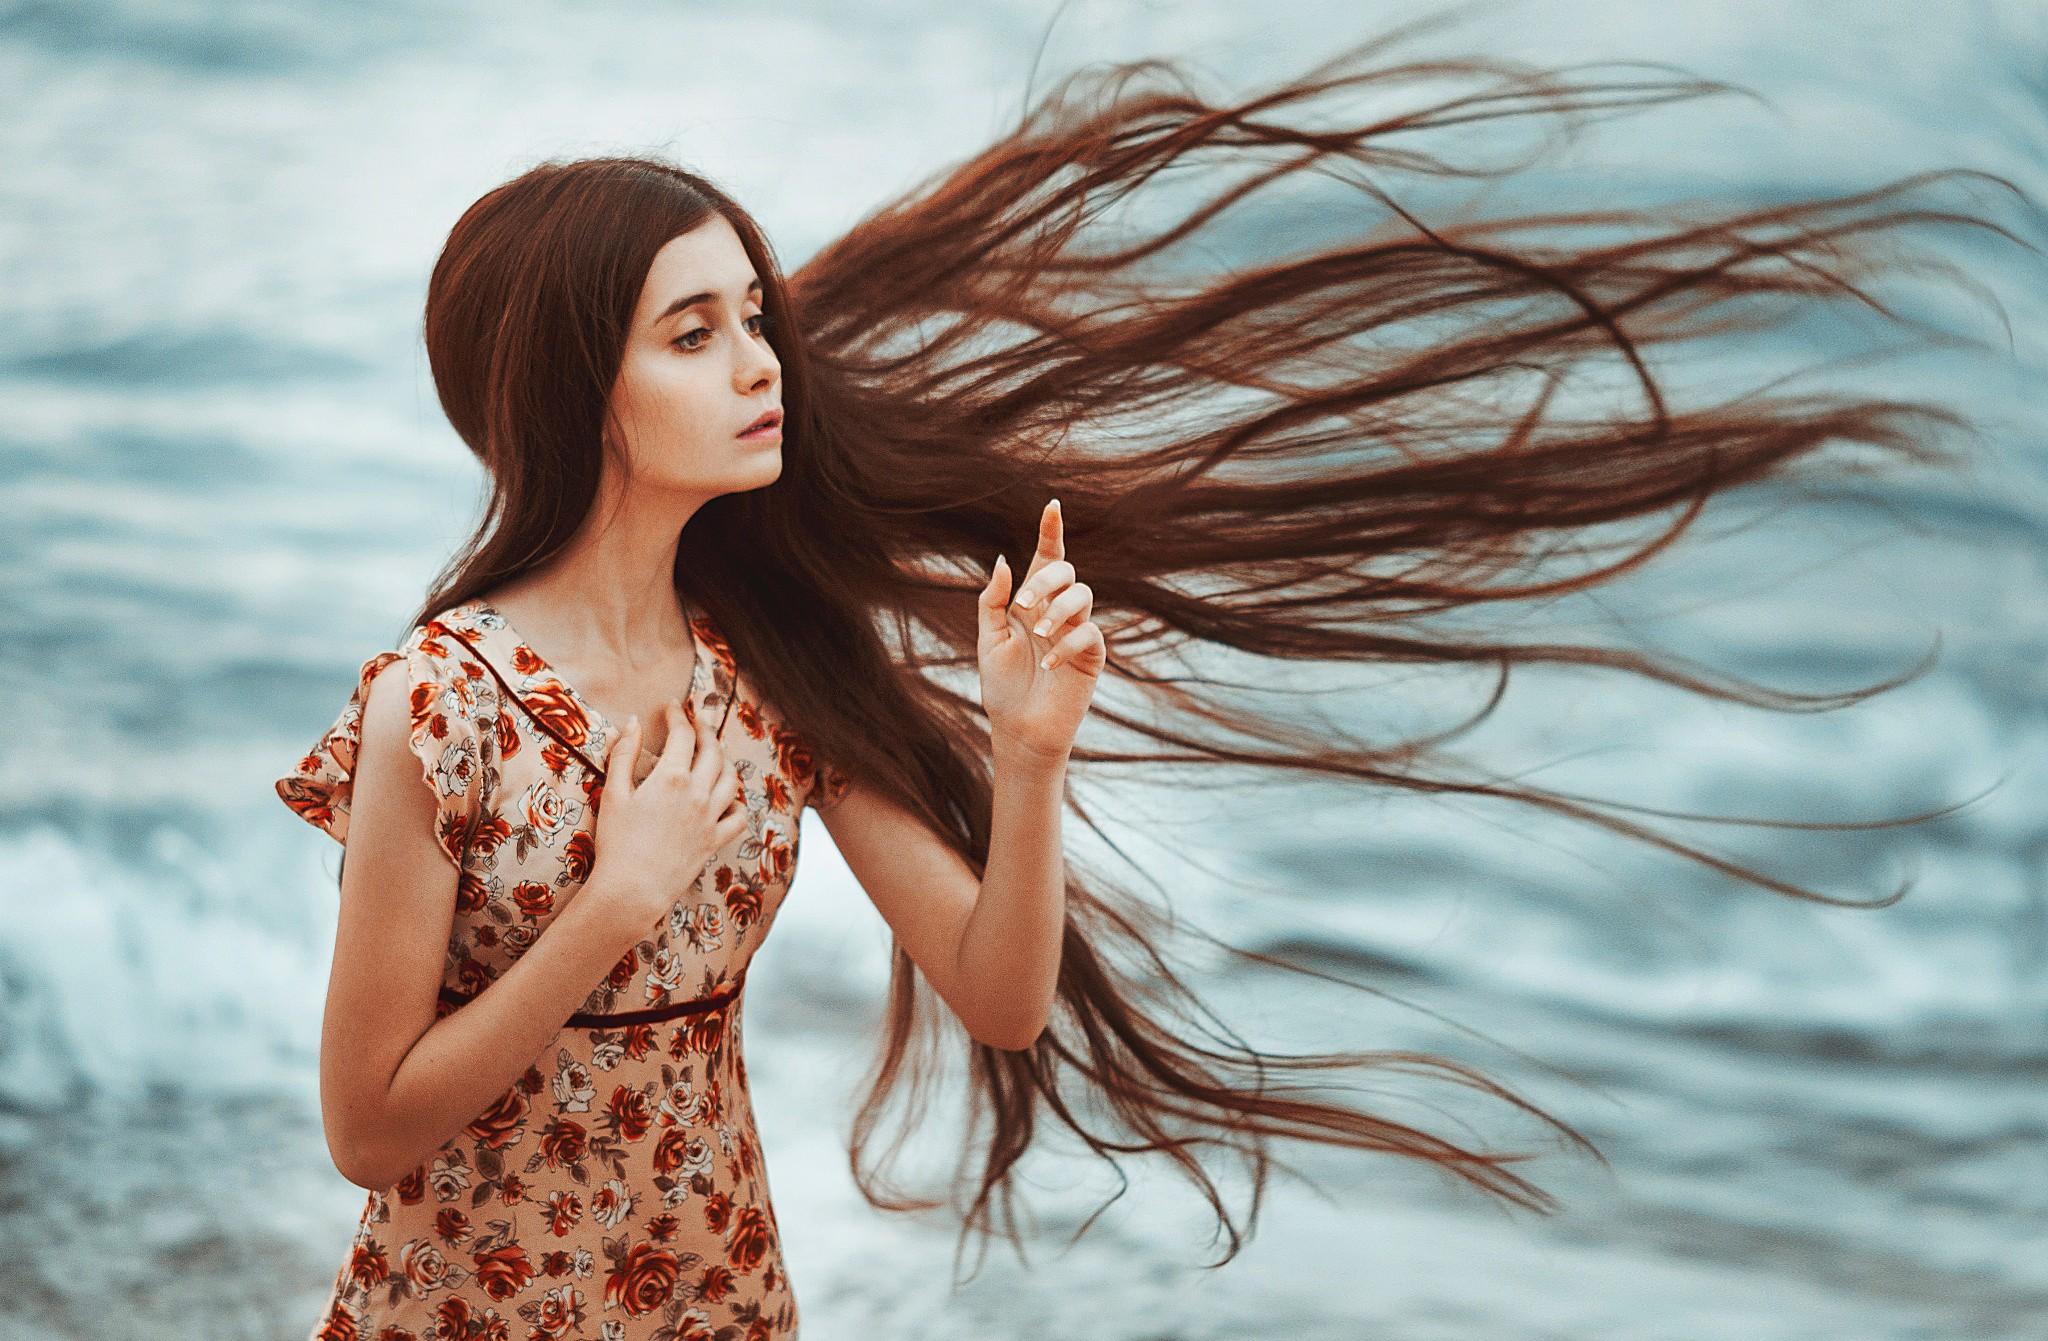 ногти картинки волосы на ветру успешно посадили